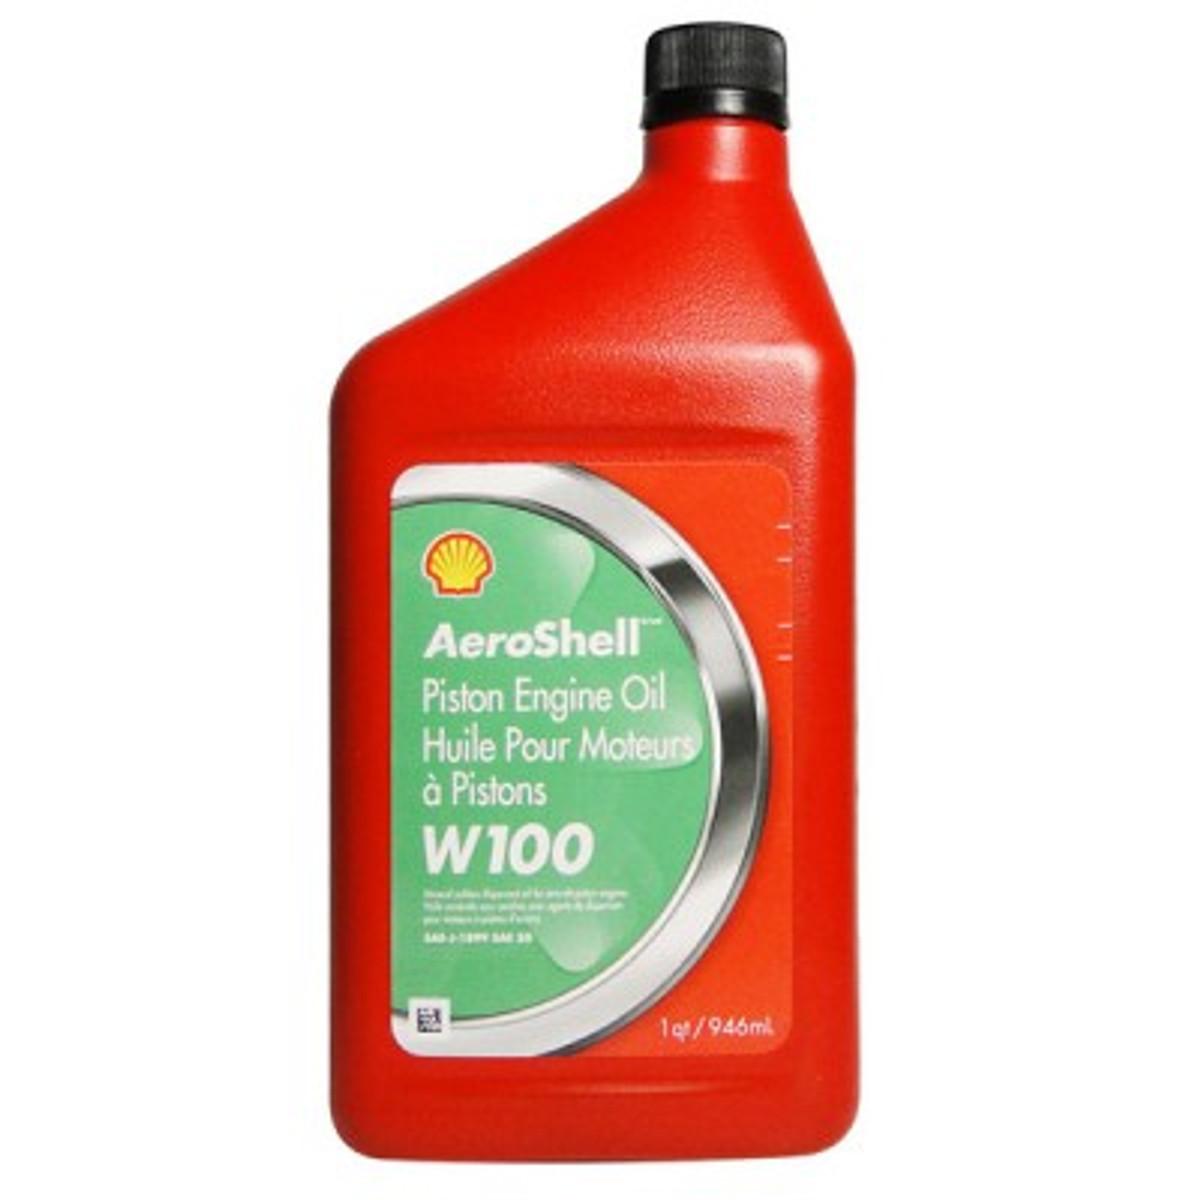 Aeroshell W100 Oil.     Case (6 quarts)